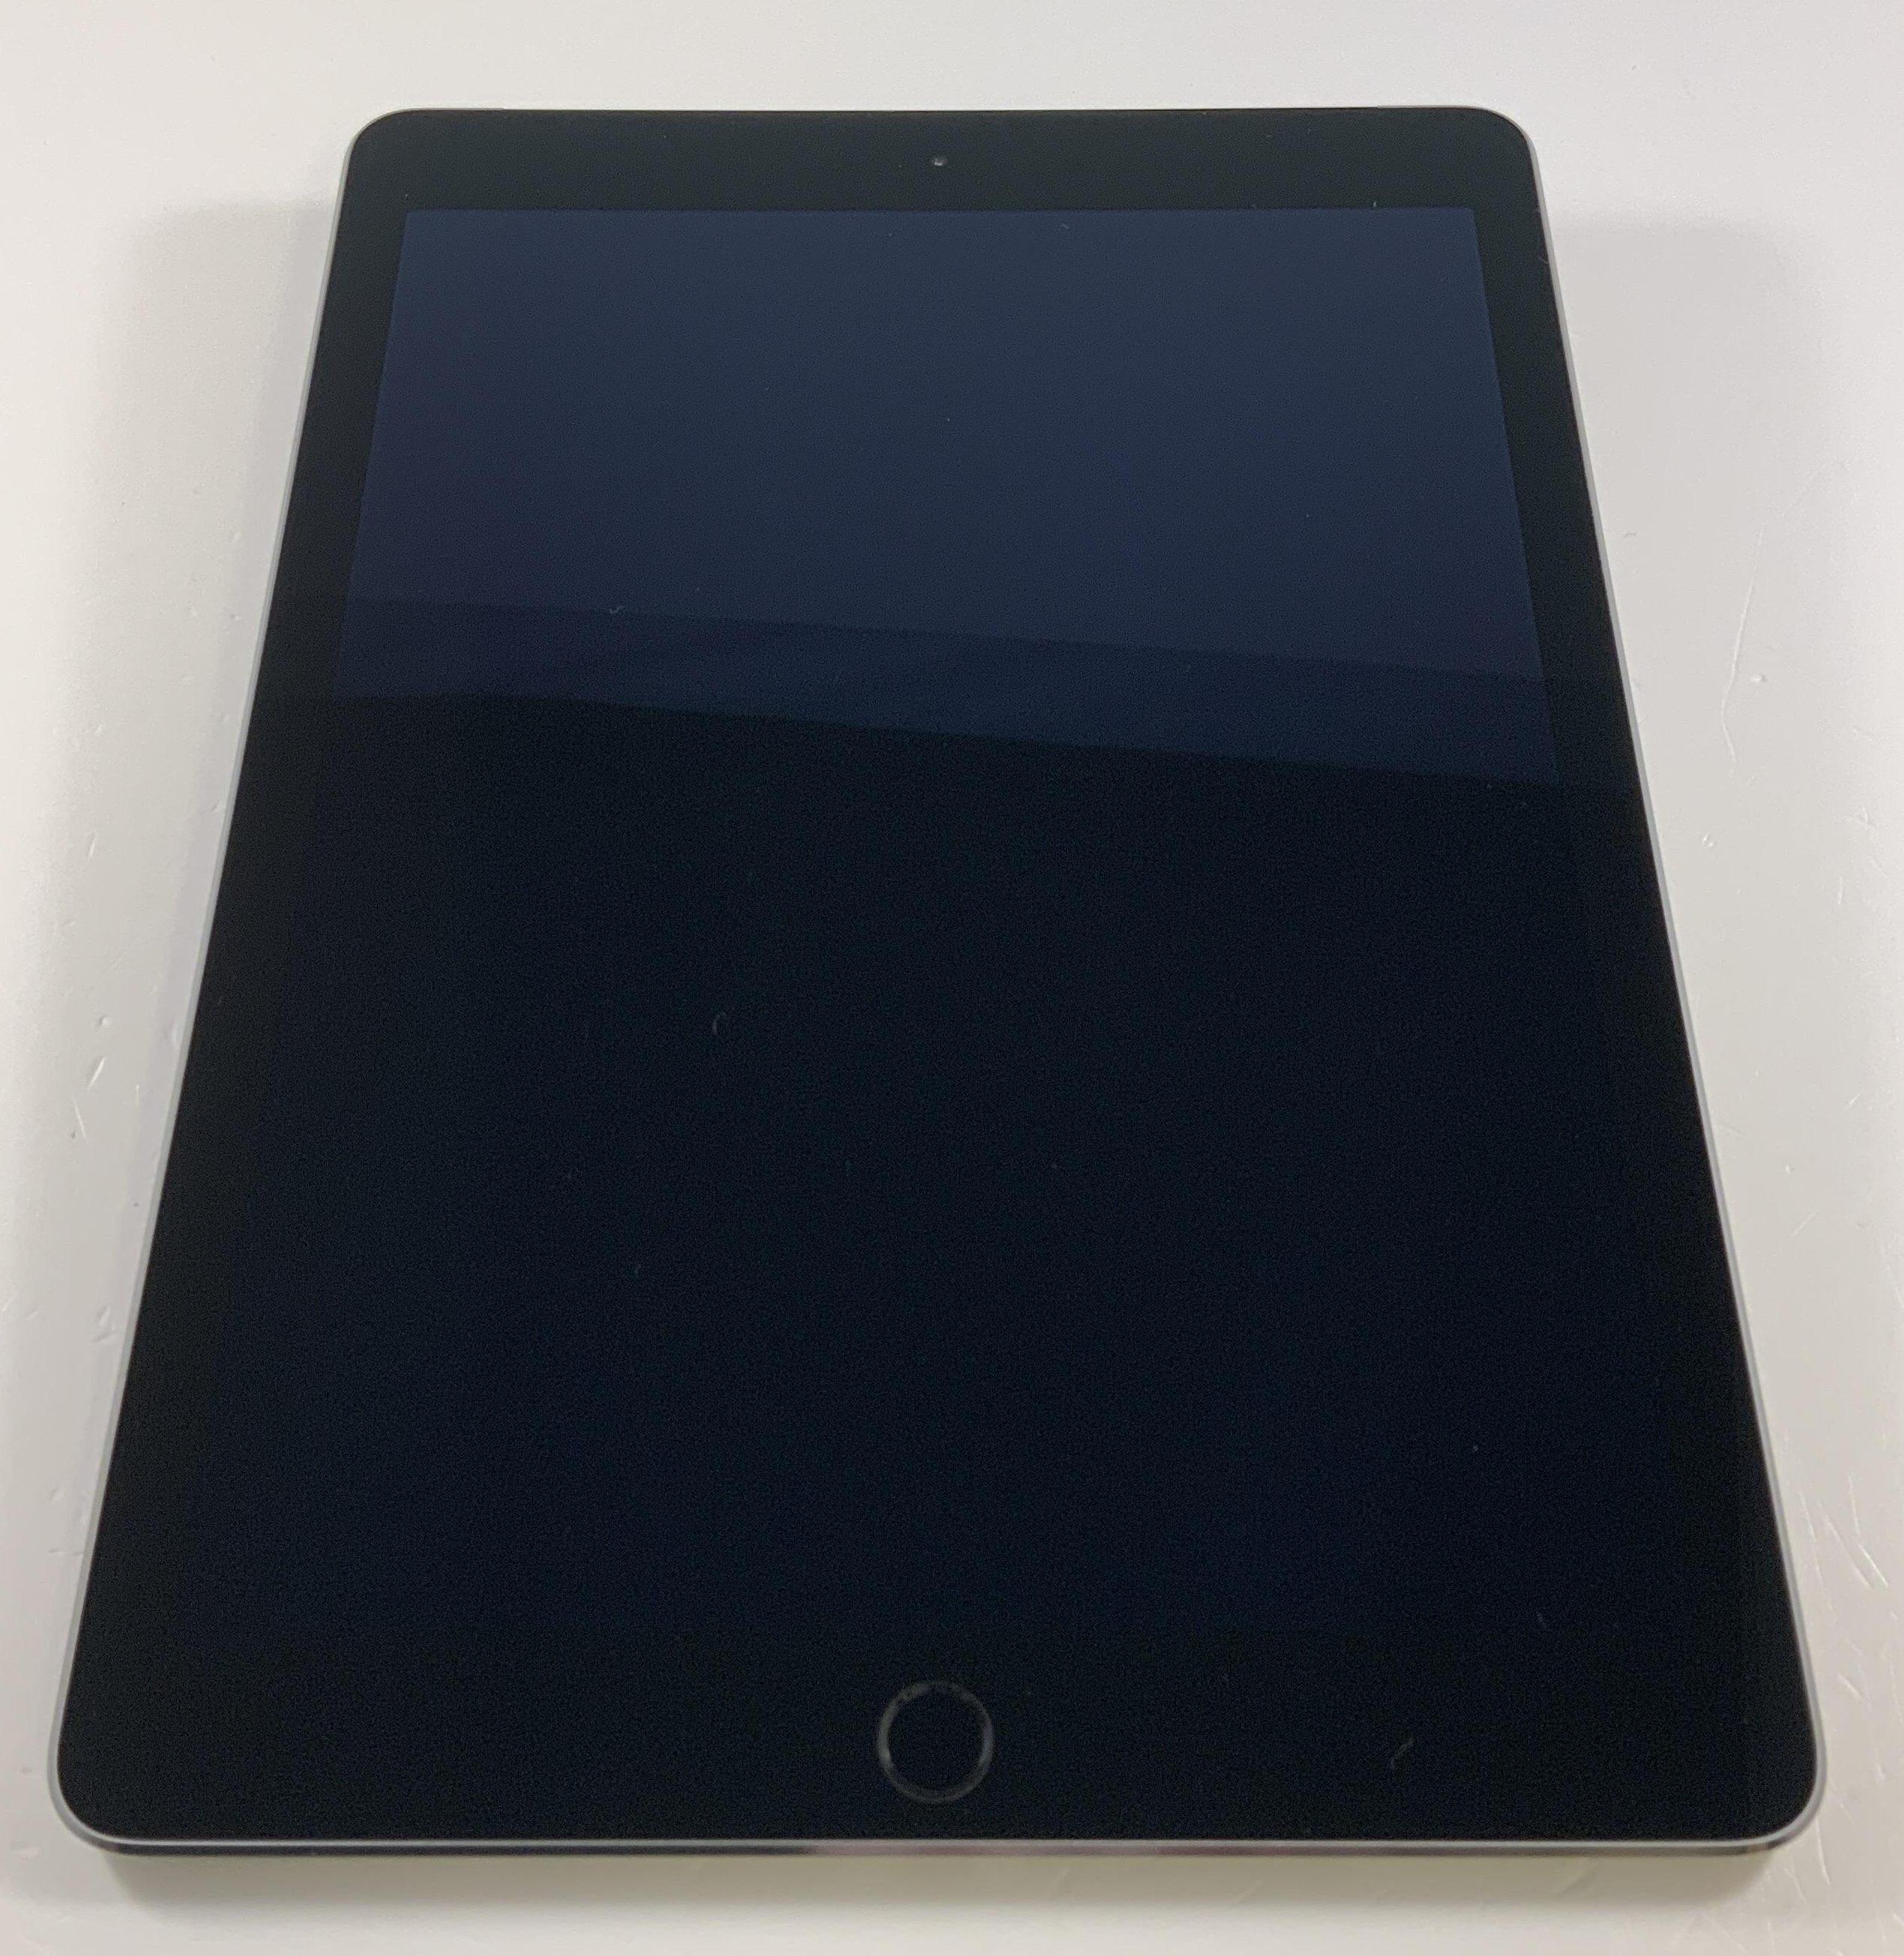 iPad Air 2 Wi-Fi + Cellular 64GB, 64GB, Space Gray, Afbeelding 1